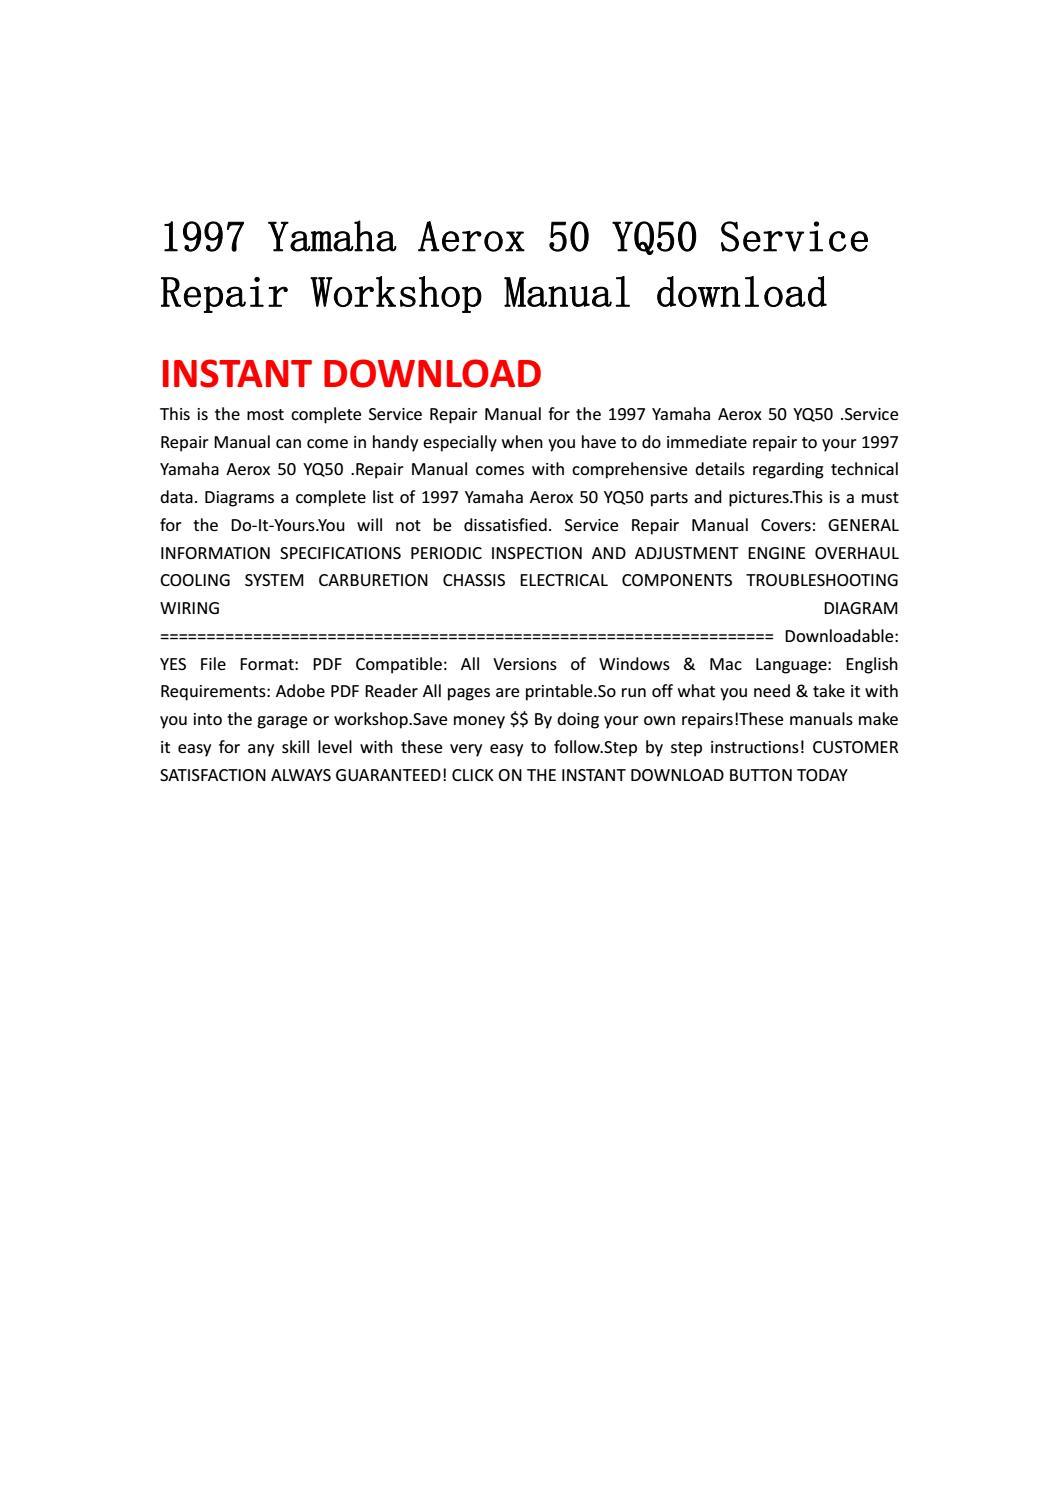 1997 yamaha aerox 50 yq50 service repair workshop manual download by  ksjefnsenfn - issuu